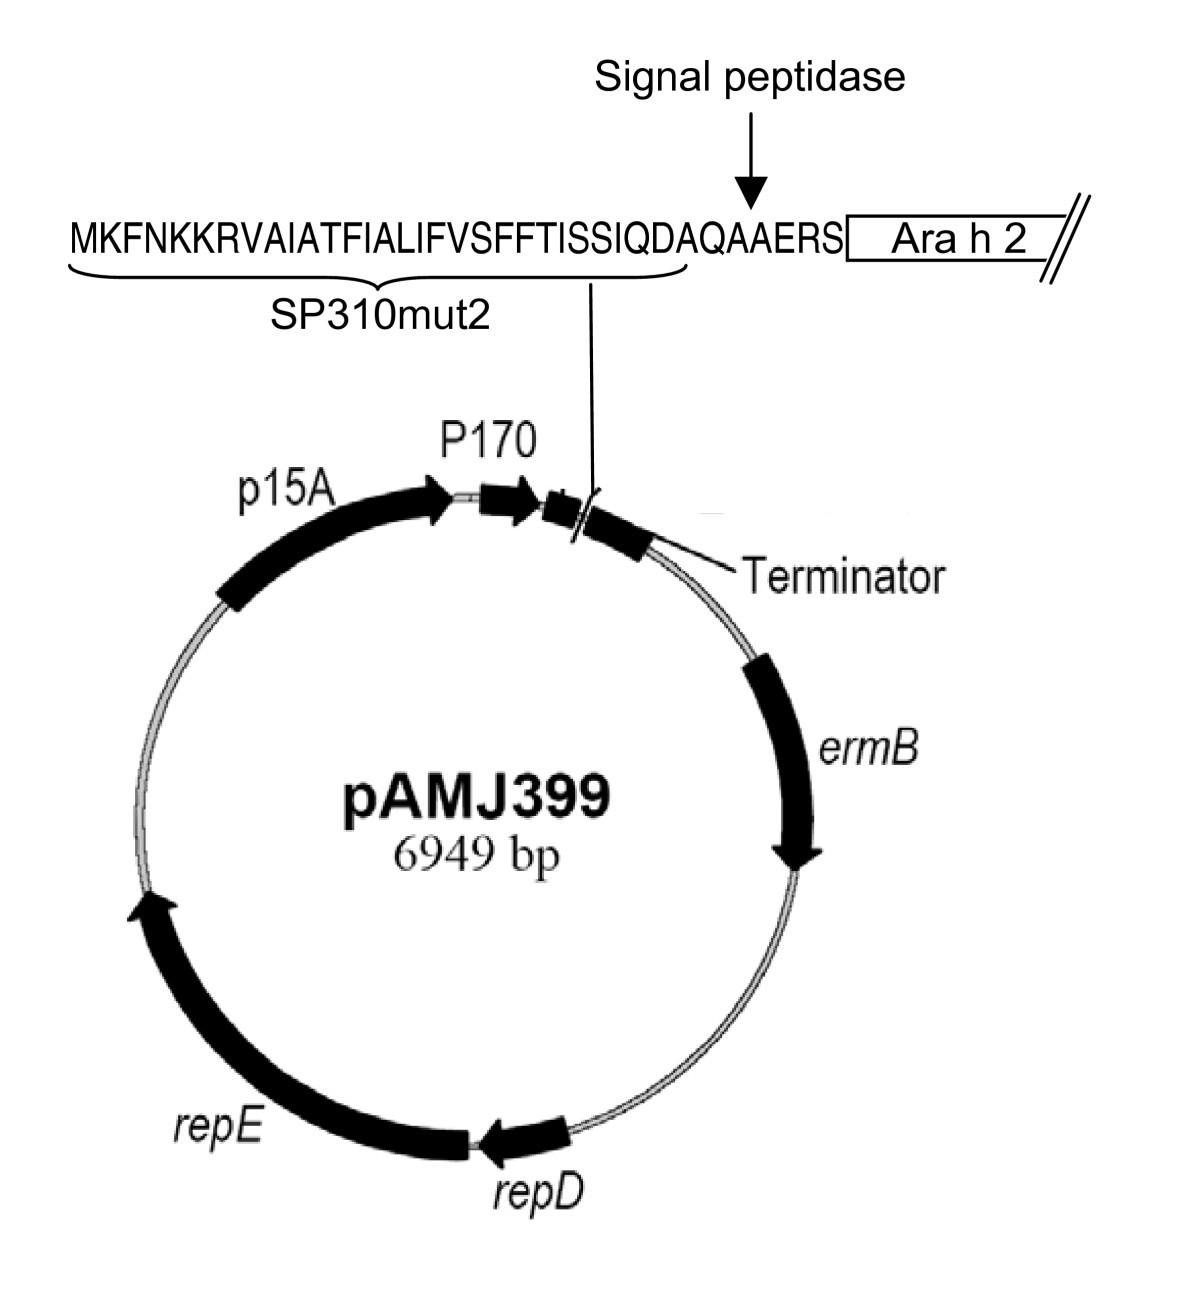 Production Of Recombinant Peanut Allergen Ara H 2 Using Lactococcus Prokaryotic Cells Ib Biology Ms Elise Figure 1